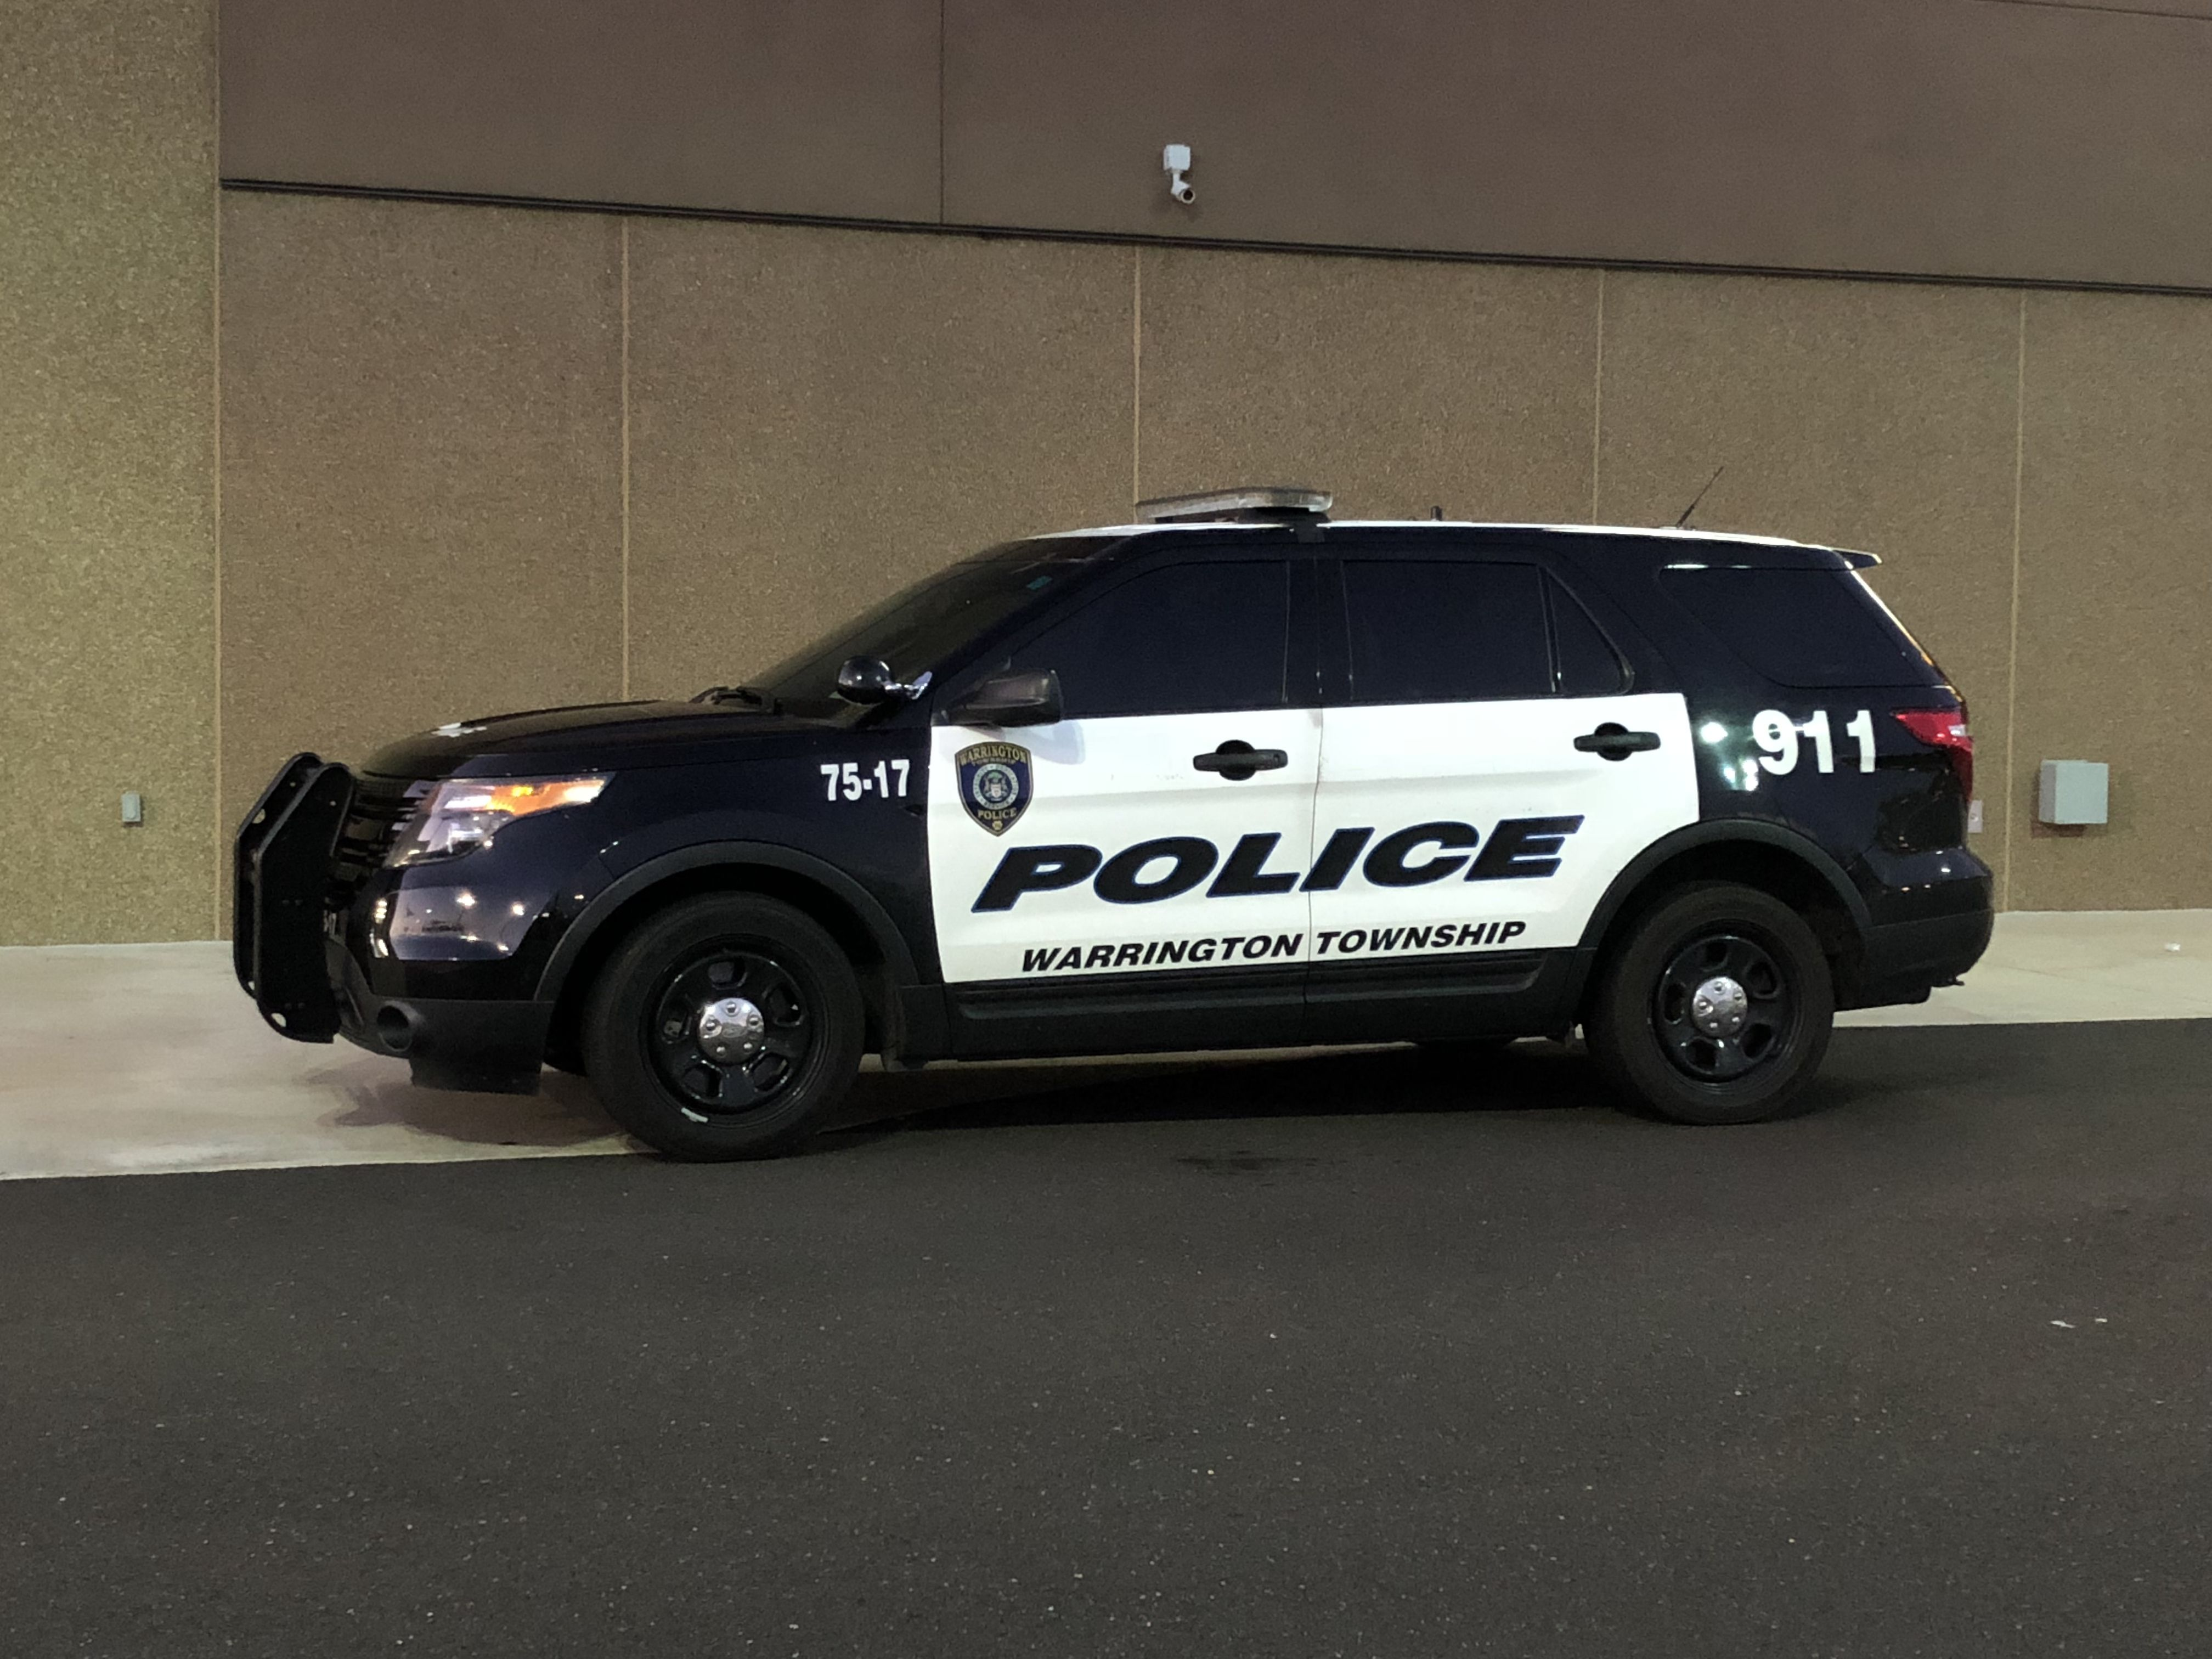 Warrington Township Pa Suv Pennsylvania Police Policecar Policesuv Policeofficer Cops Police Cars Police Emergency Vehicles